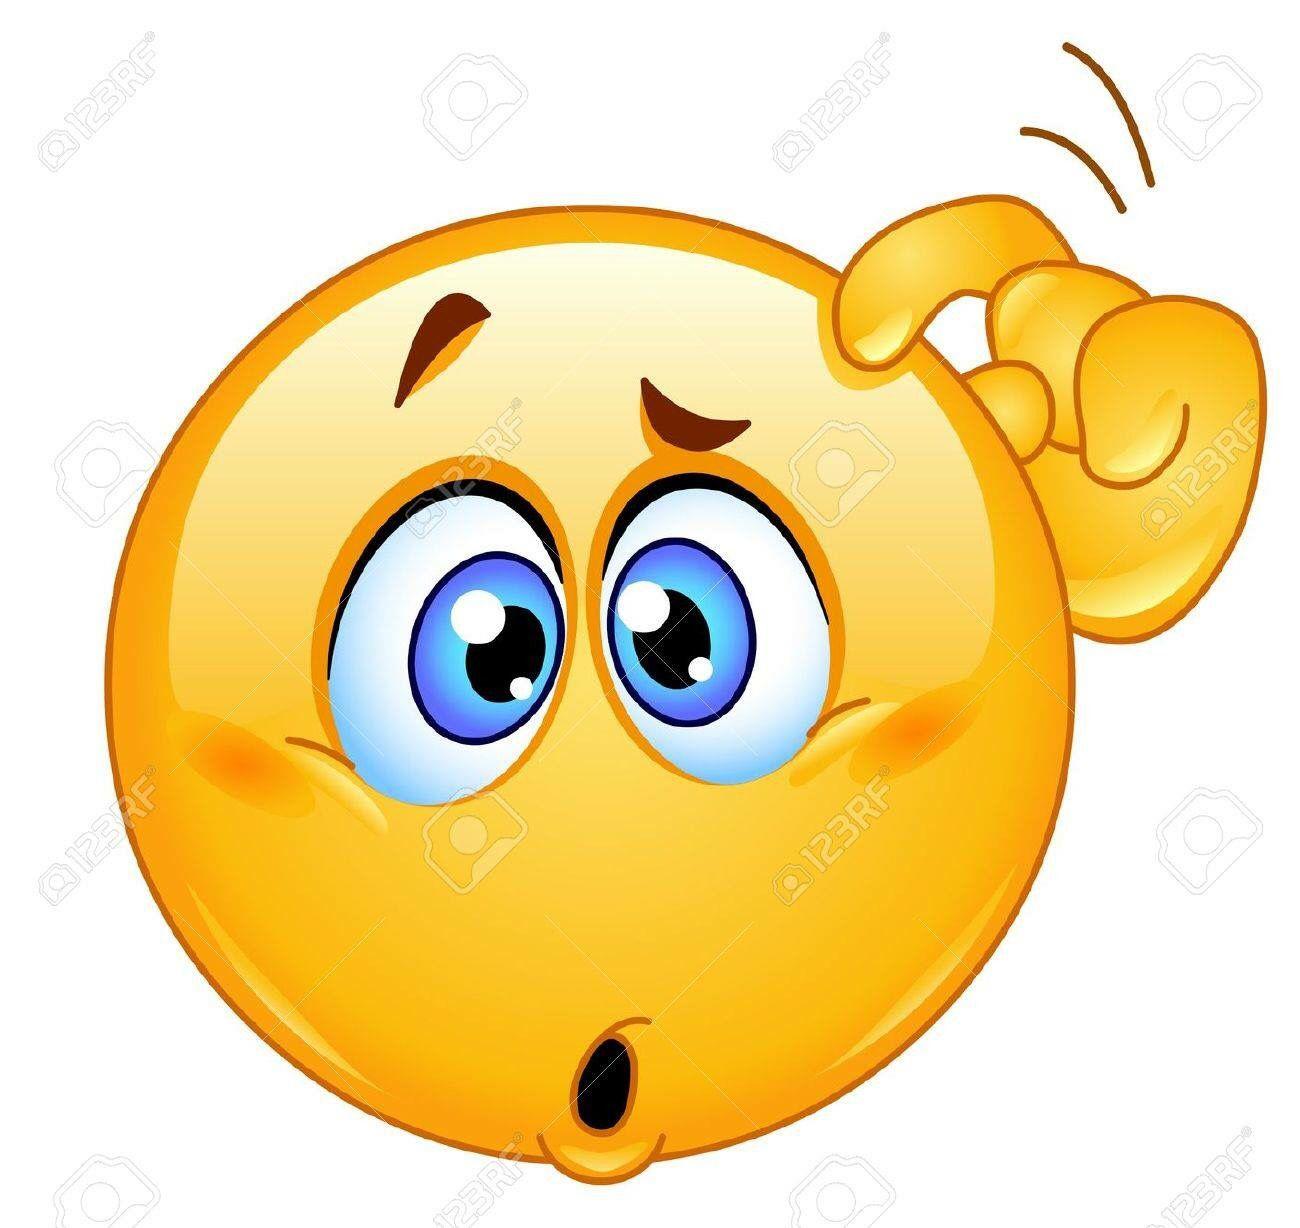 Pin by jenny elliott on my emojis pinterest emojis emojis biocorpaavc